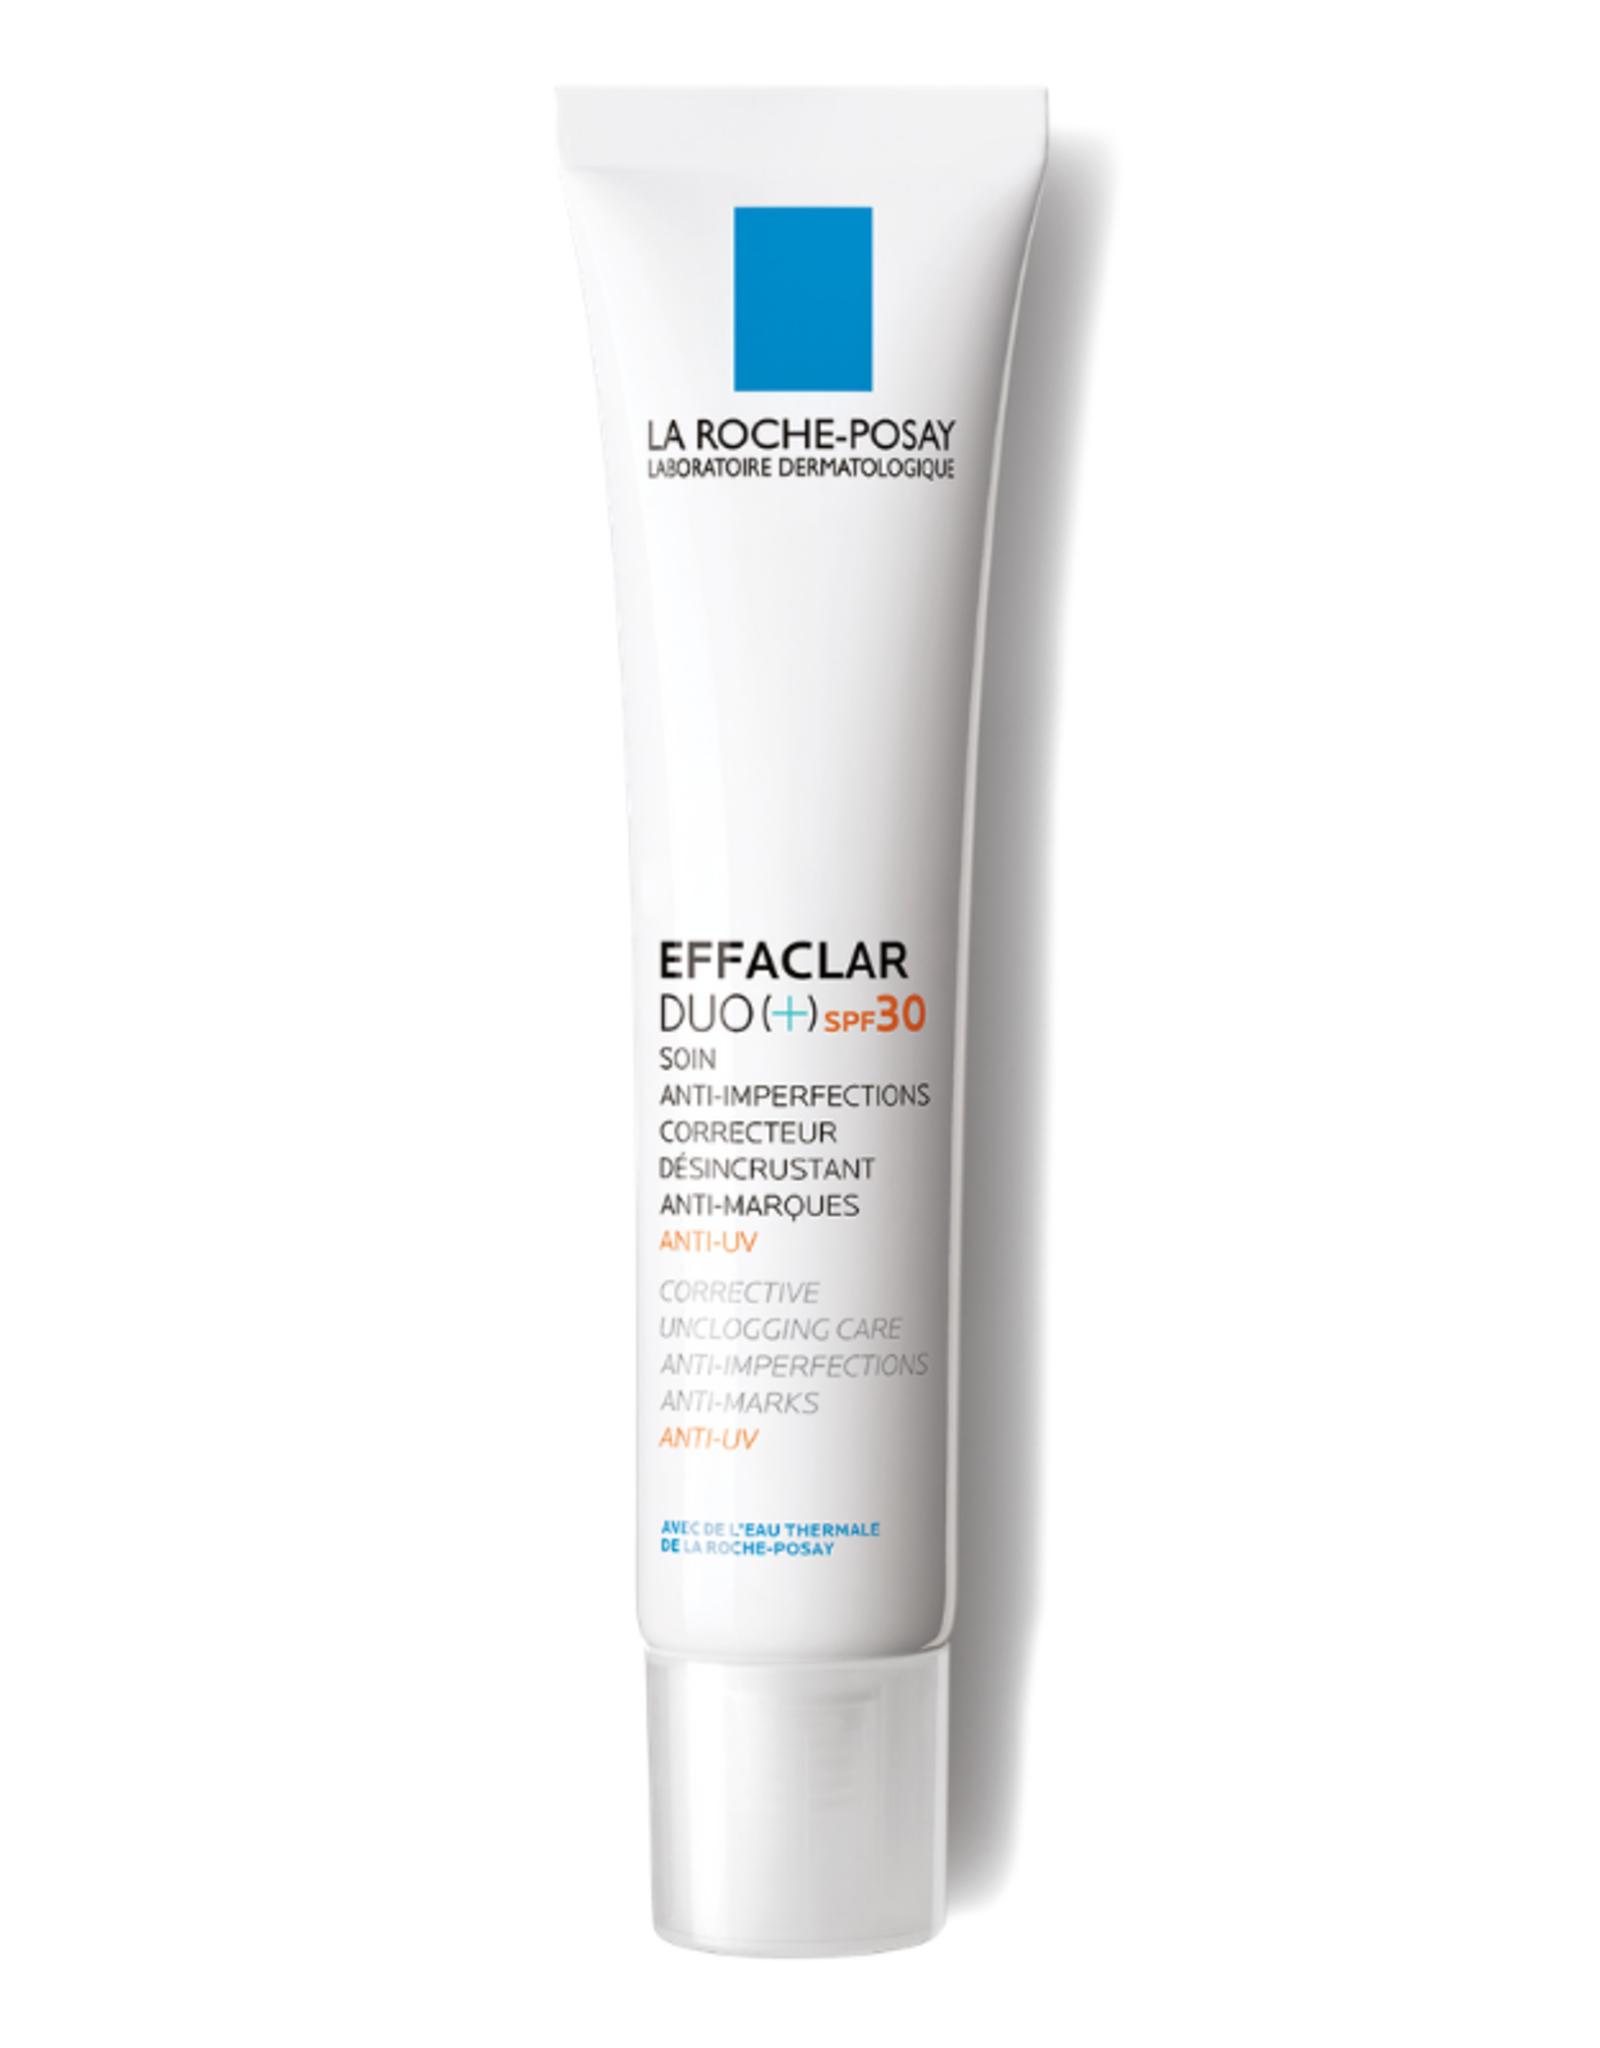 La Roche Posay Effaclar Duo+ gel creme 40ml SPF30